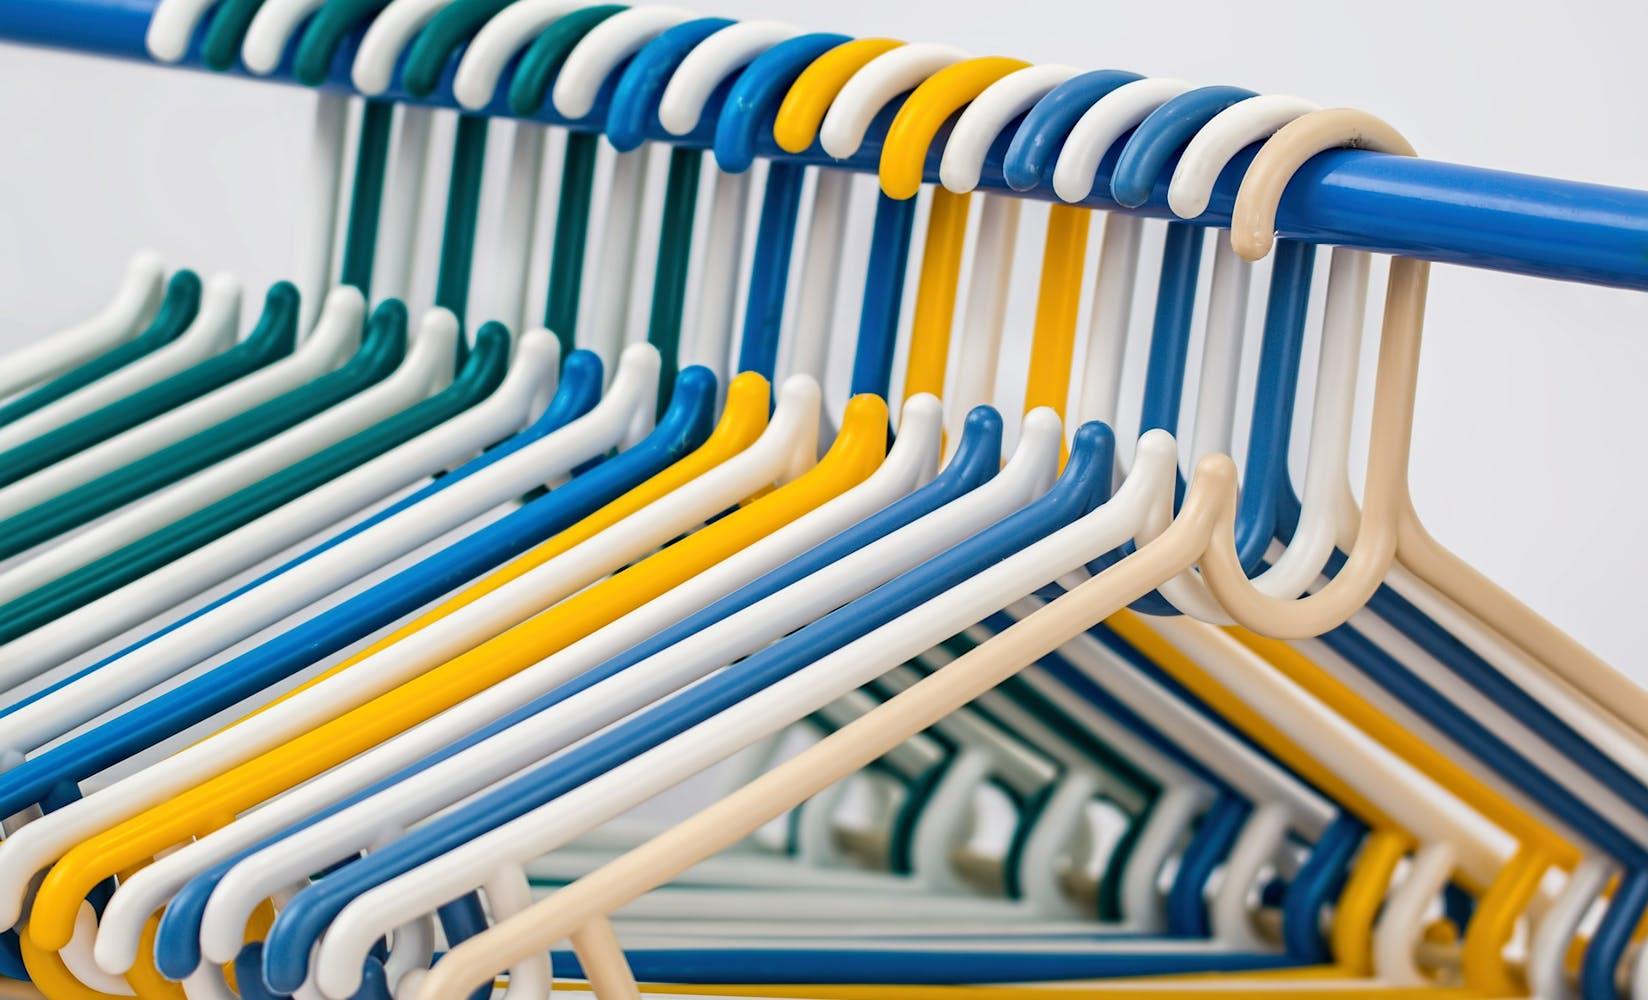 Clothes hangers 582212 1920